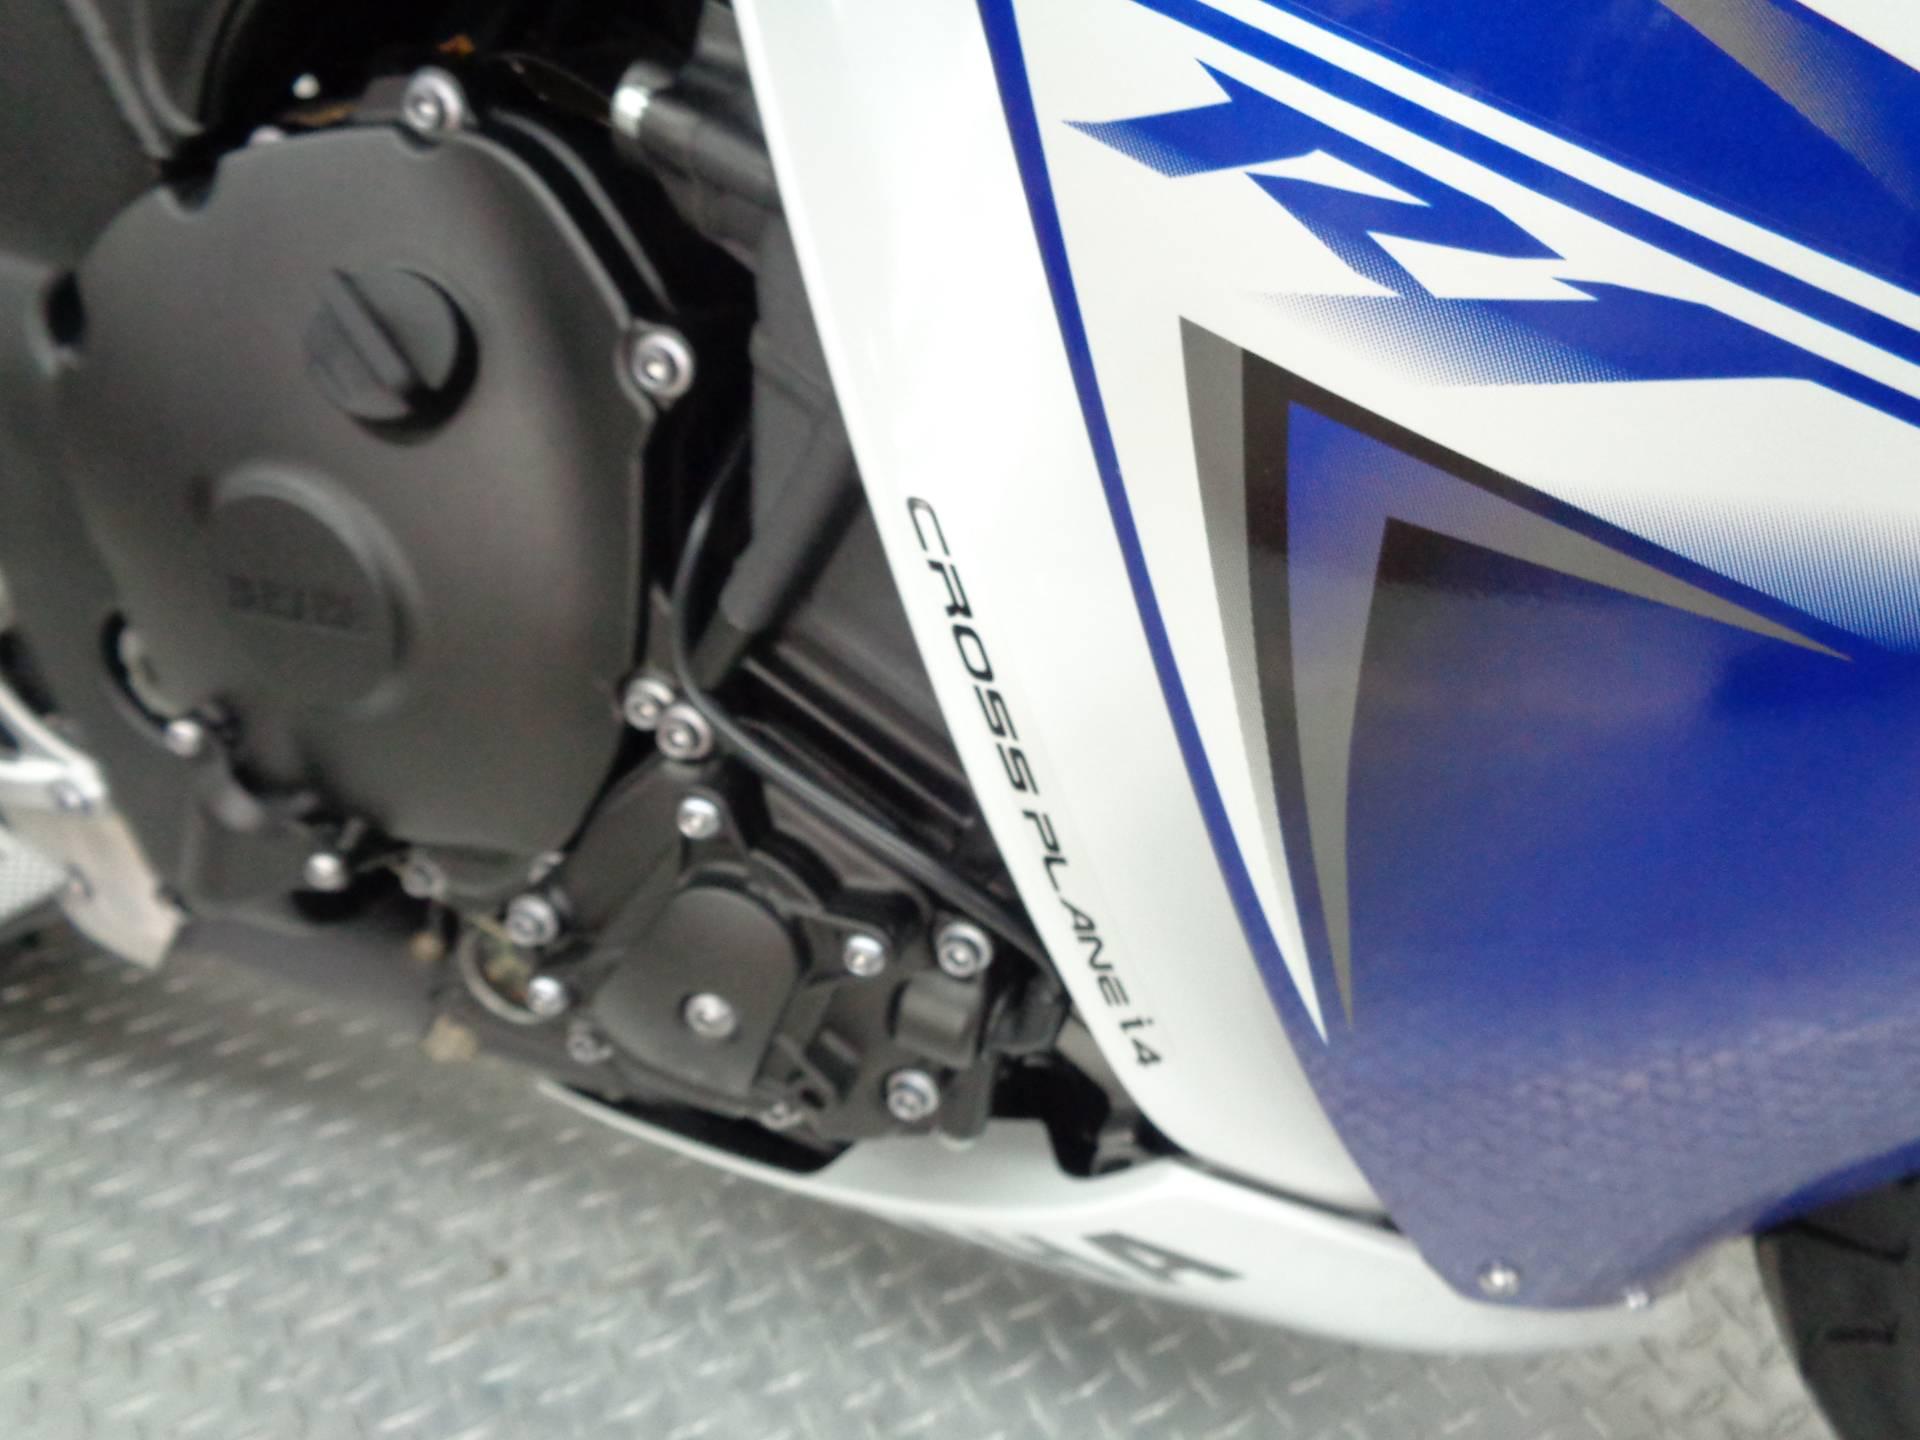 2010 Yamaha YZF-R1 11